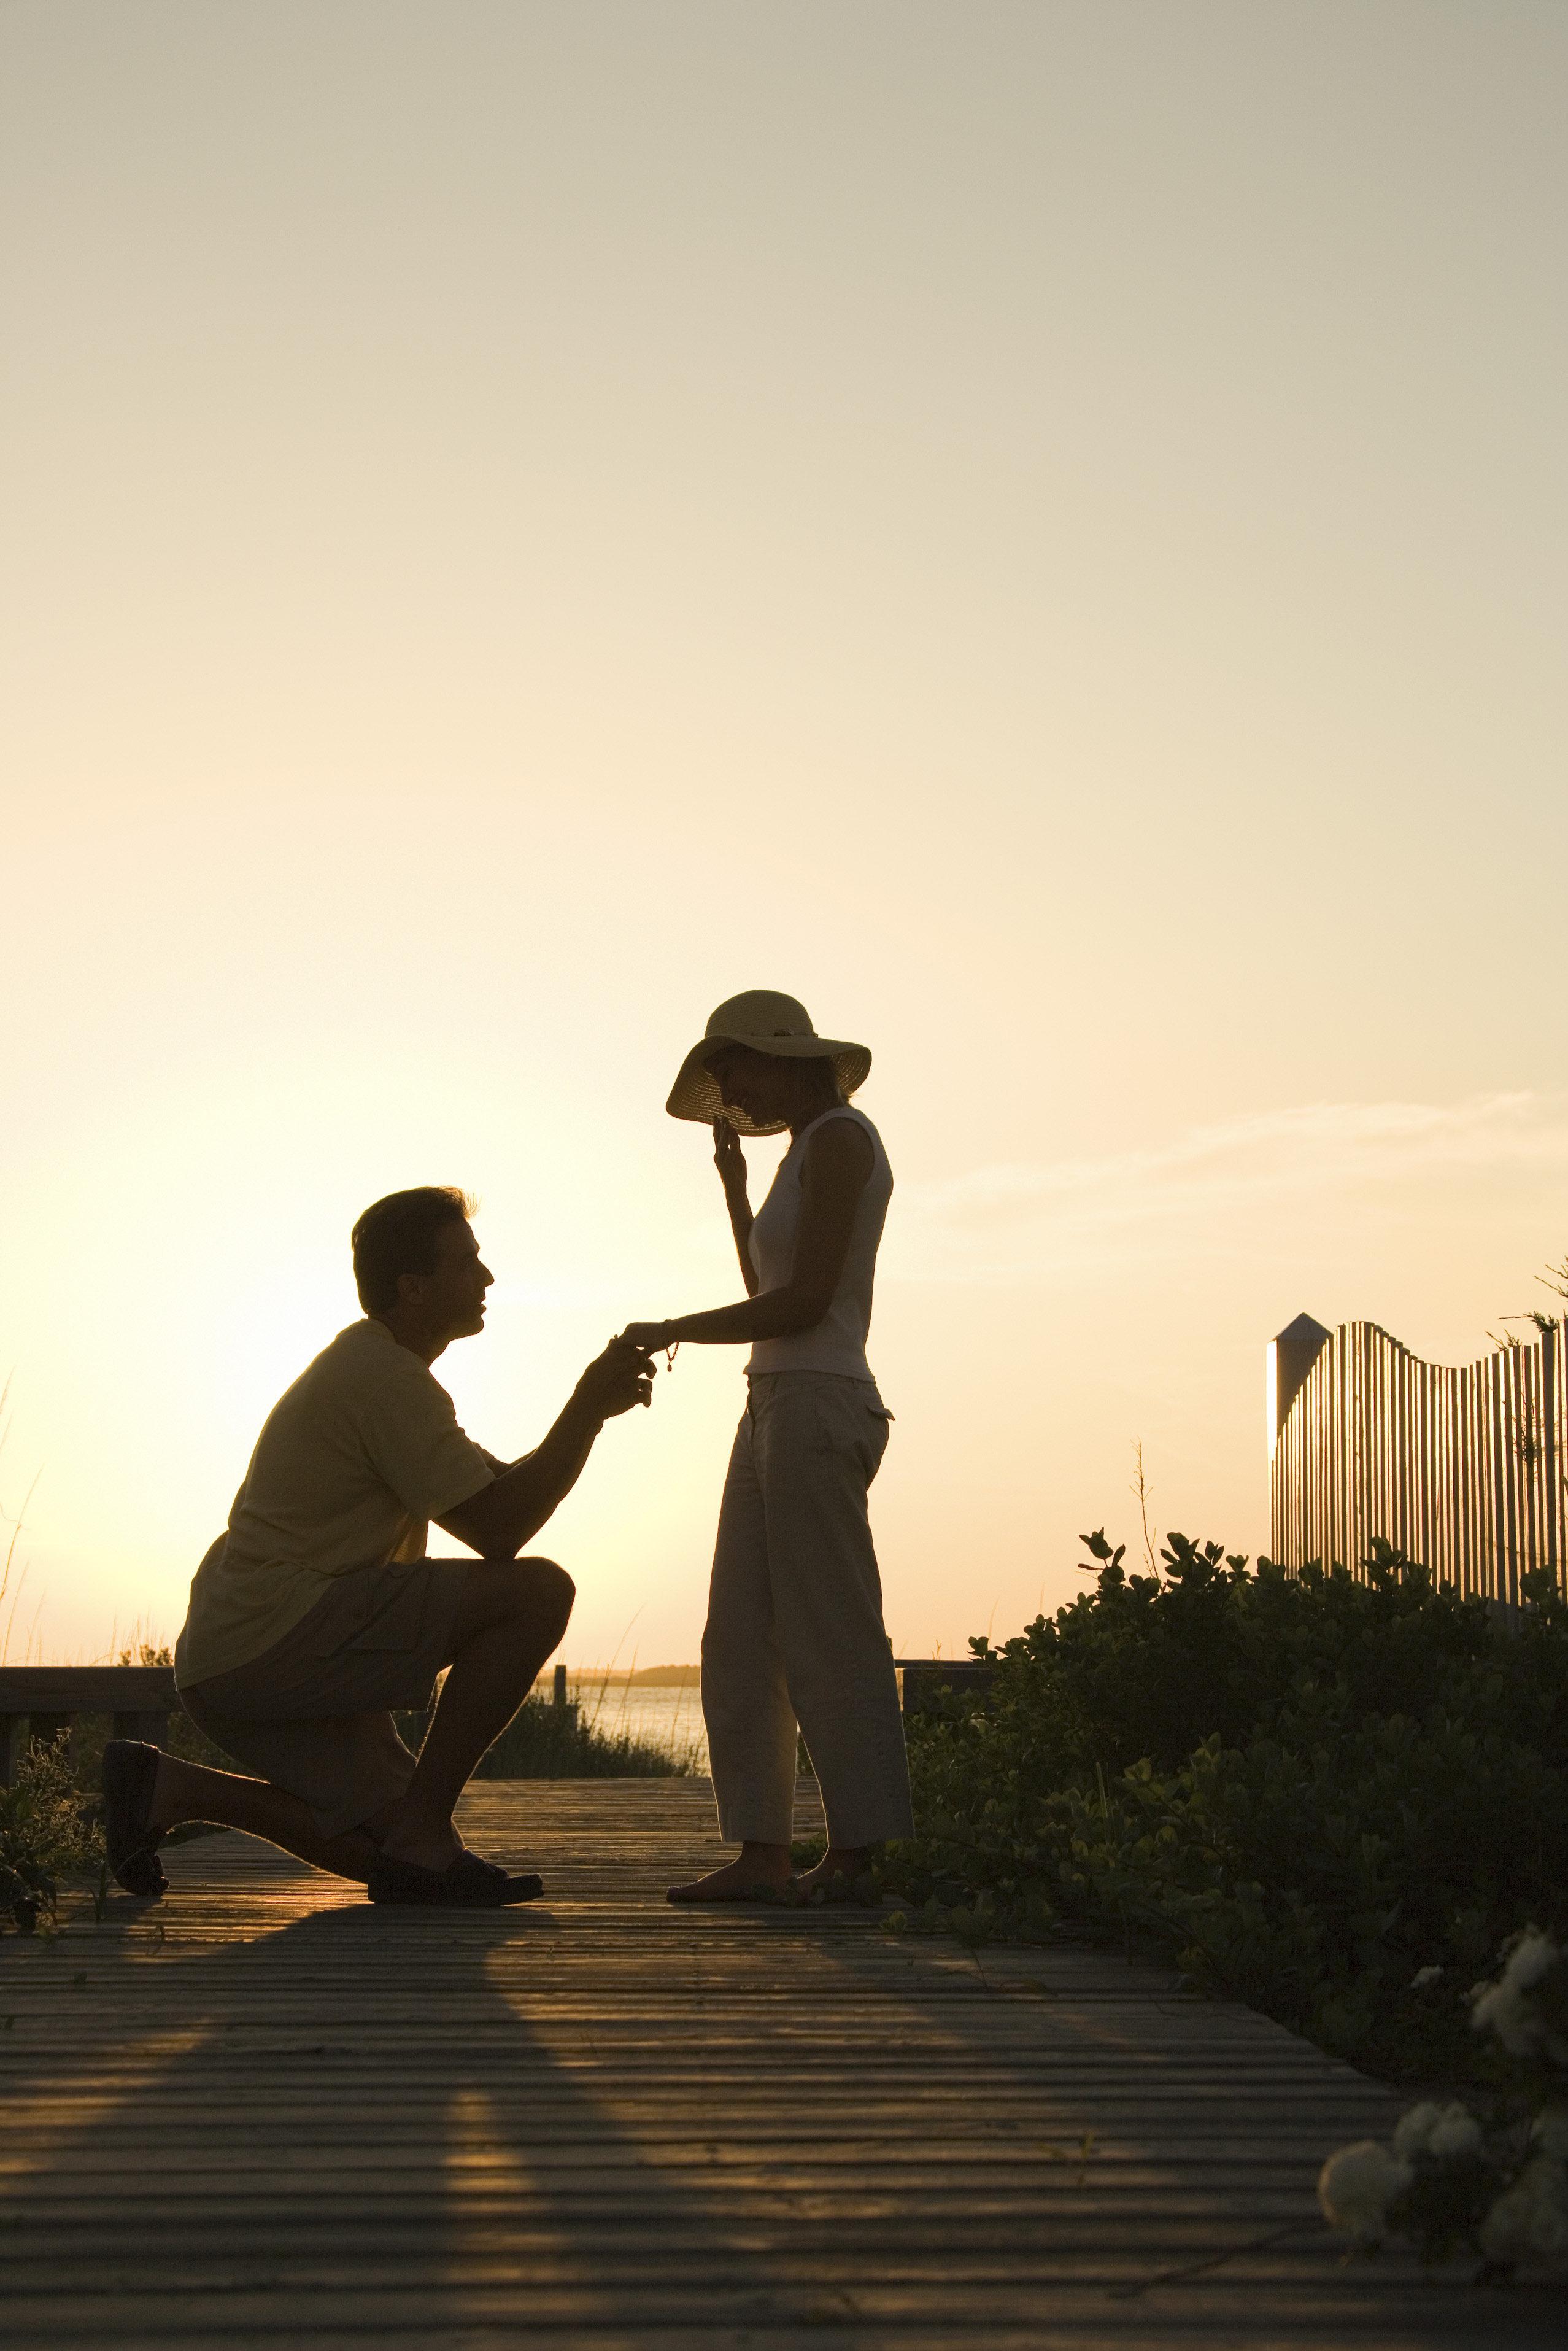 Silhouette of man proposing to woman on beach boardwalk